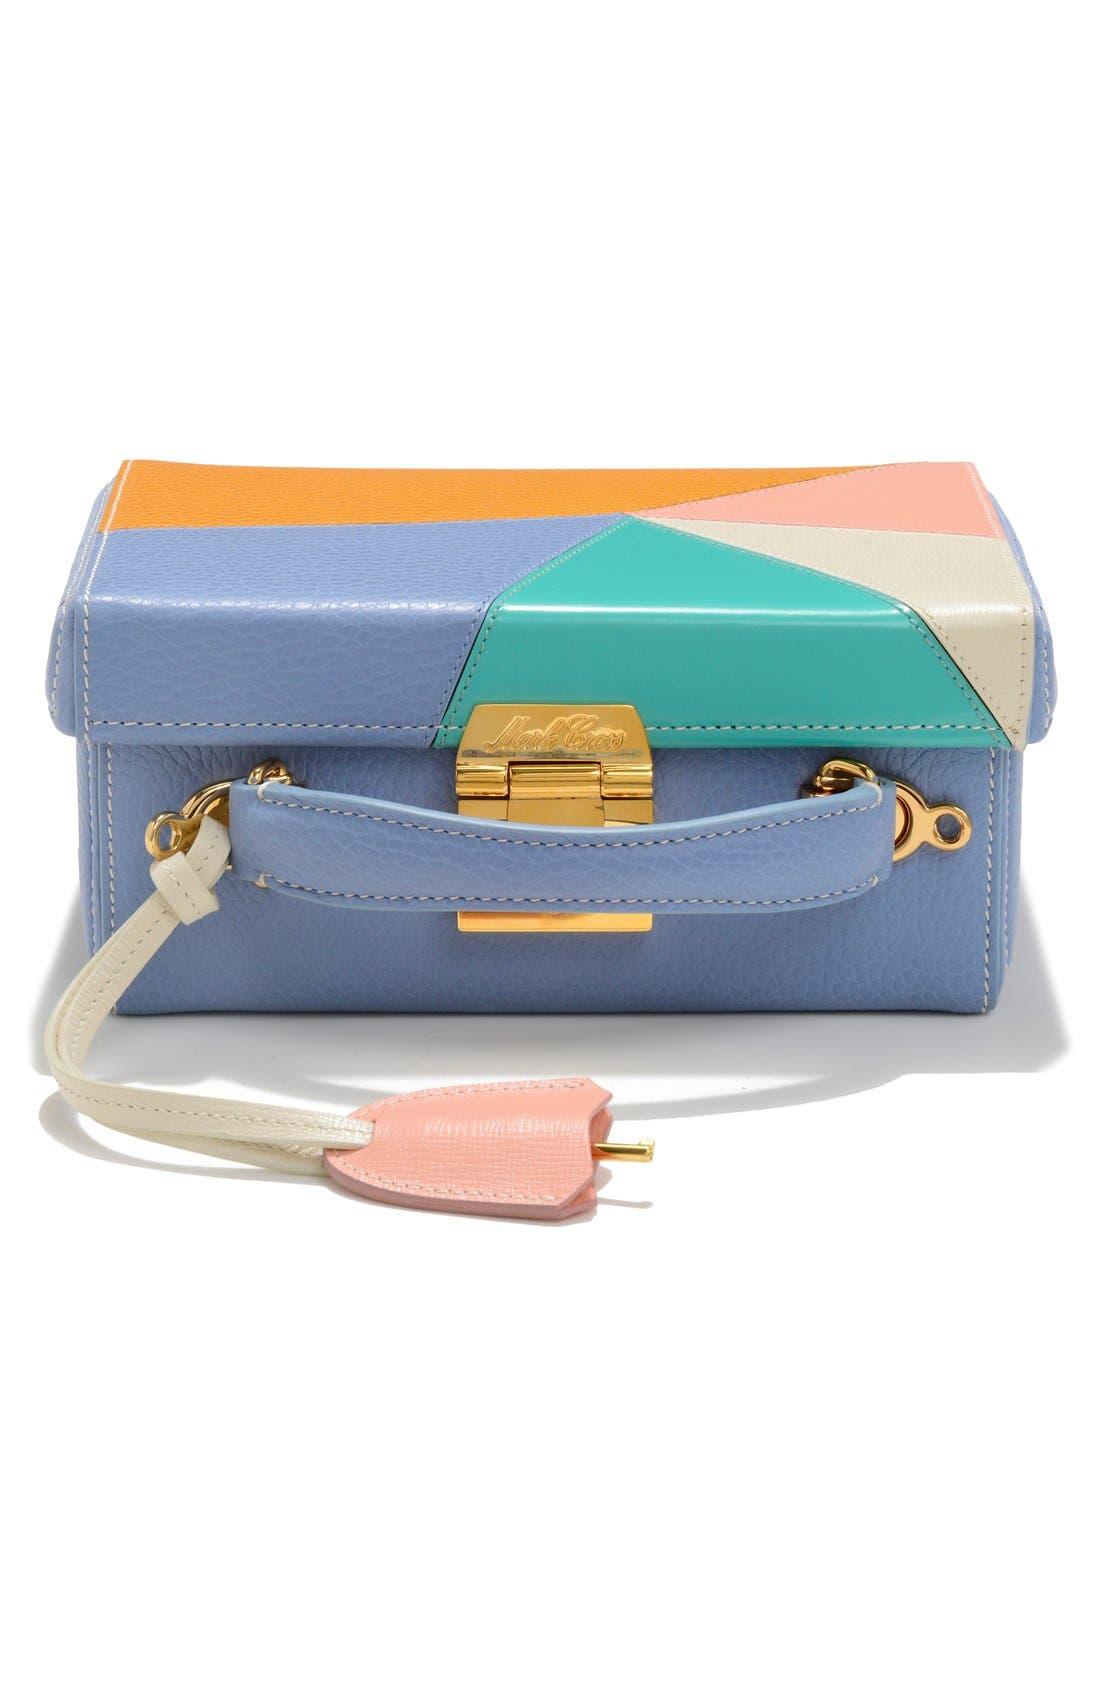 MARK CROSS,                             'Small Grace - Kaleidoscope' Leather Box Bag,                             Alternate thumbnail 3, color,                             400